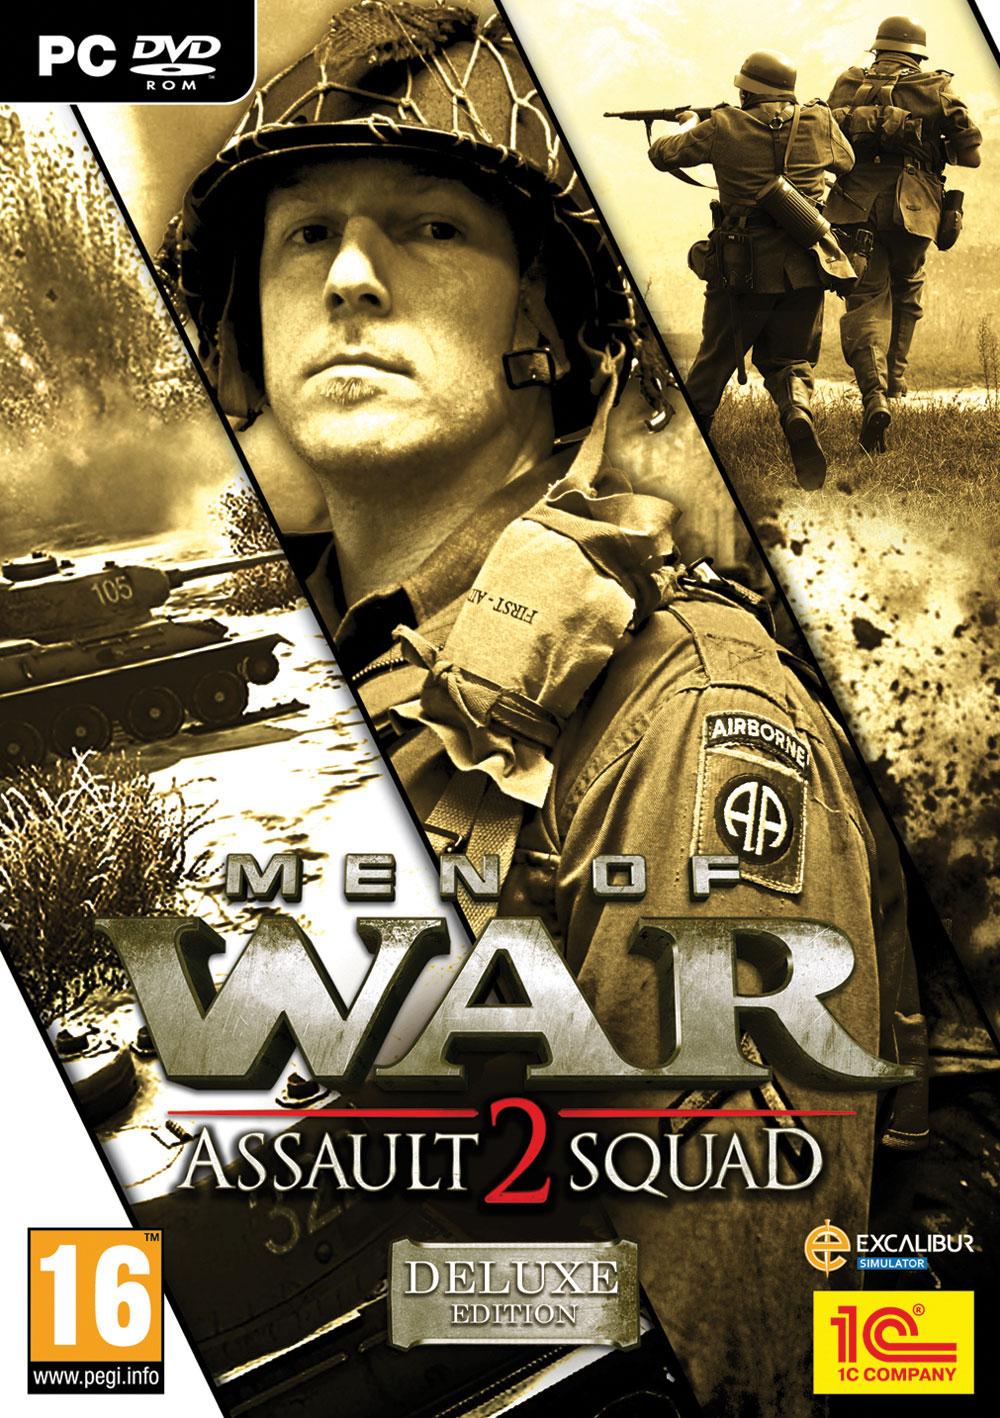 MEN OF WAR_ASSAULTSQUAD 2((تکی4000تومان عمده2000تومان(هر5عدد) ))